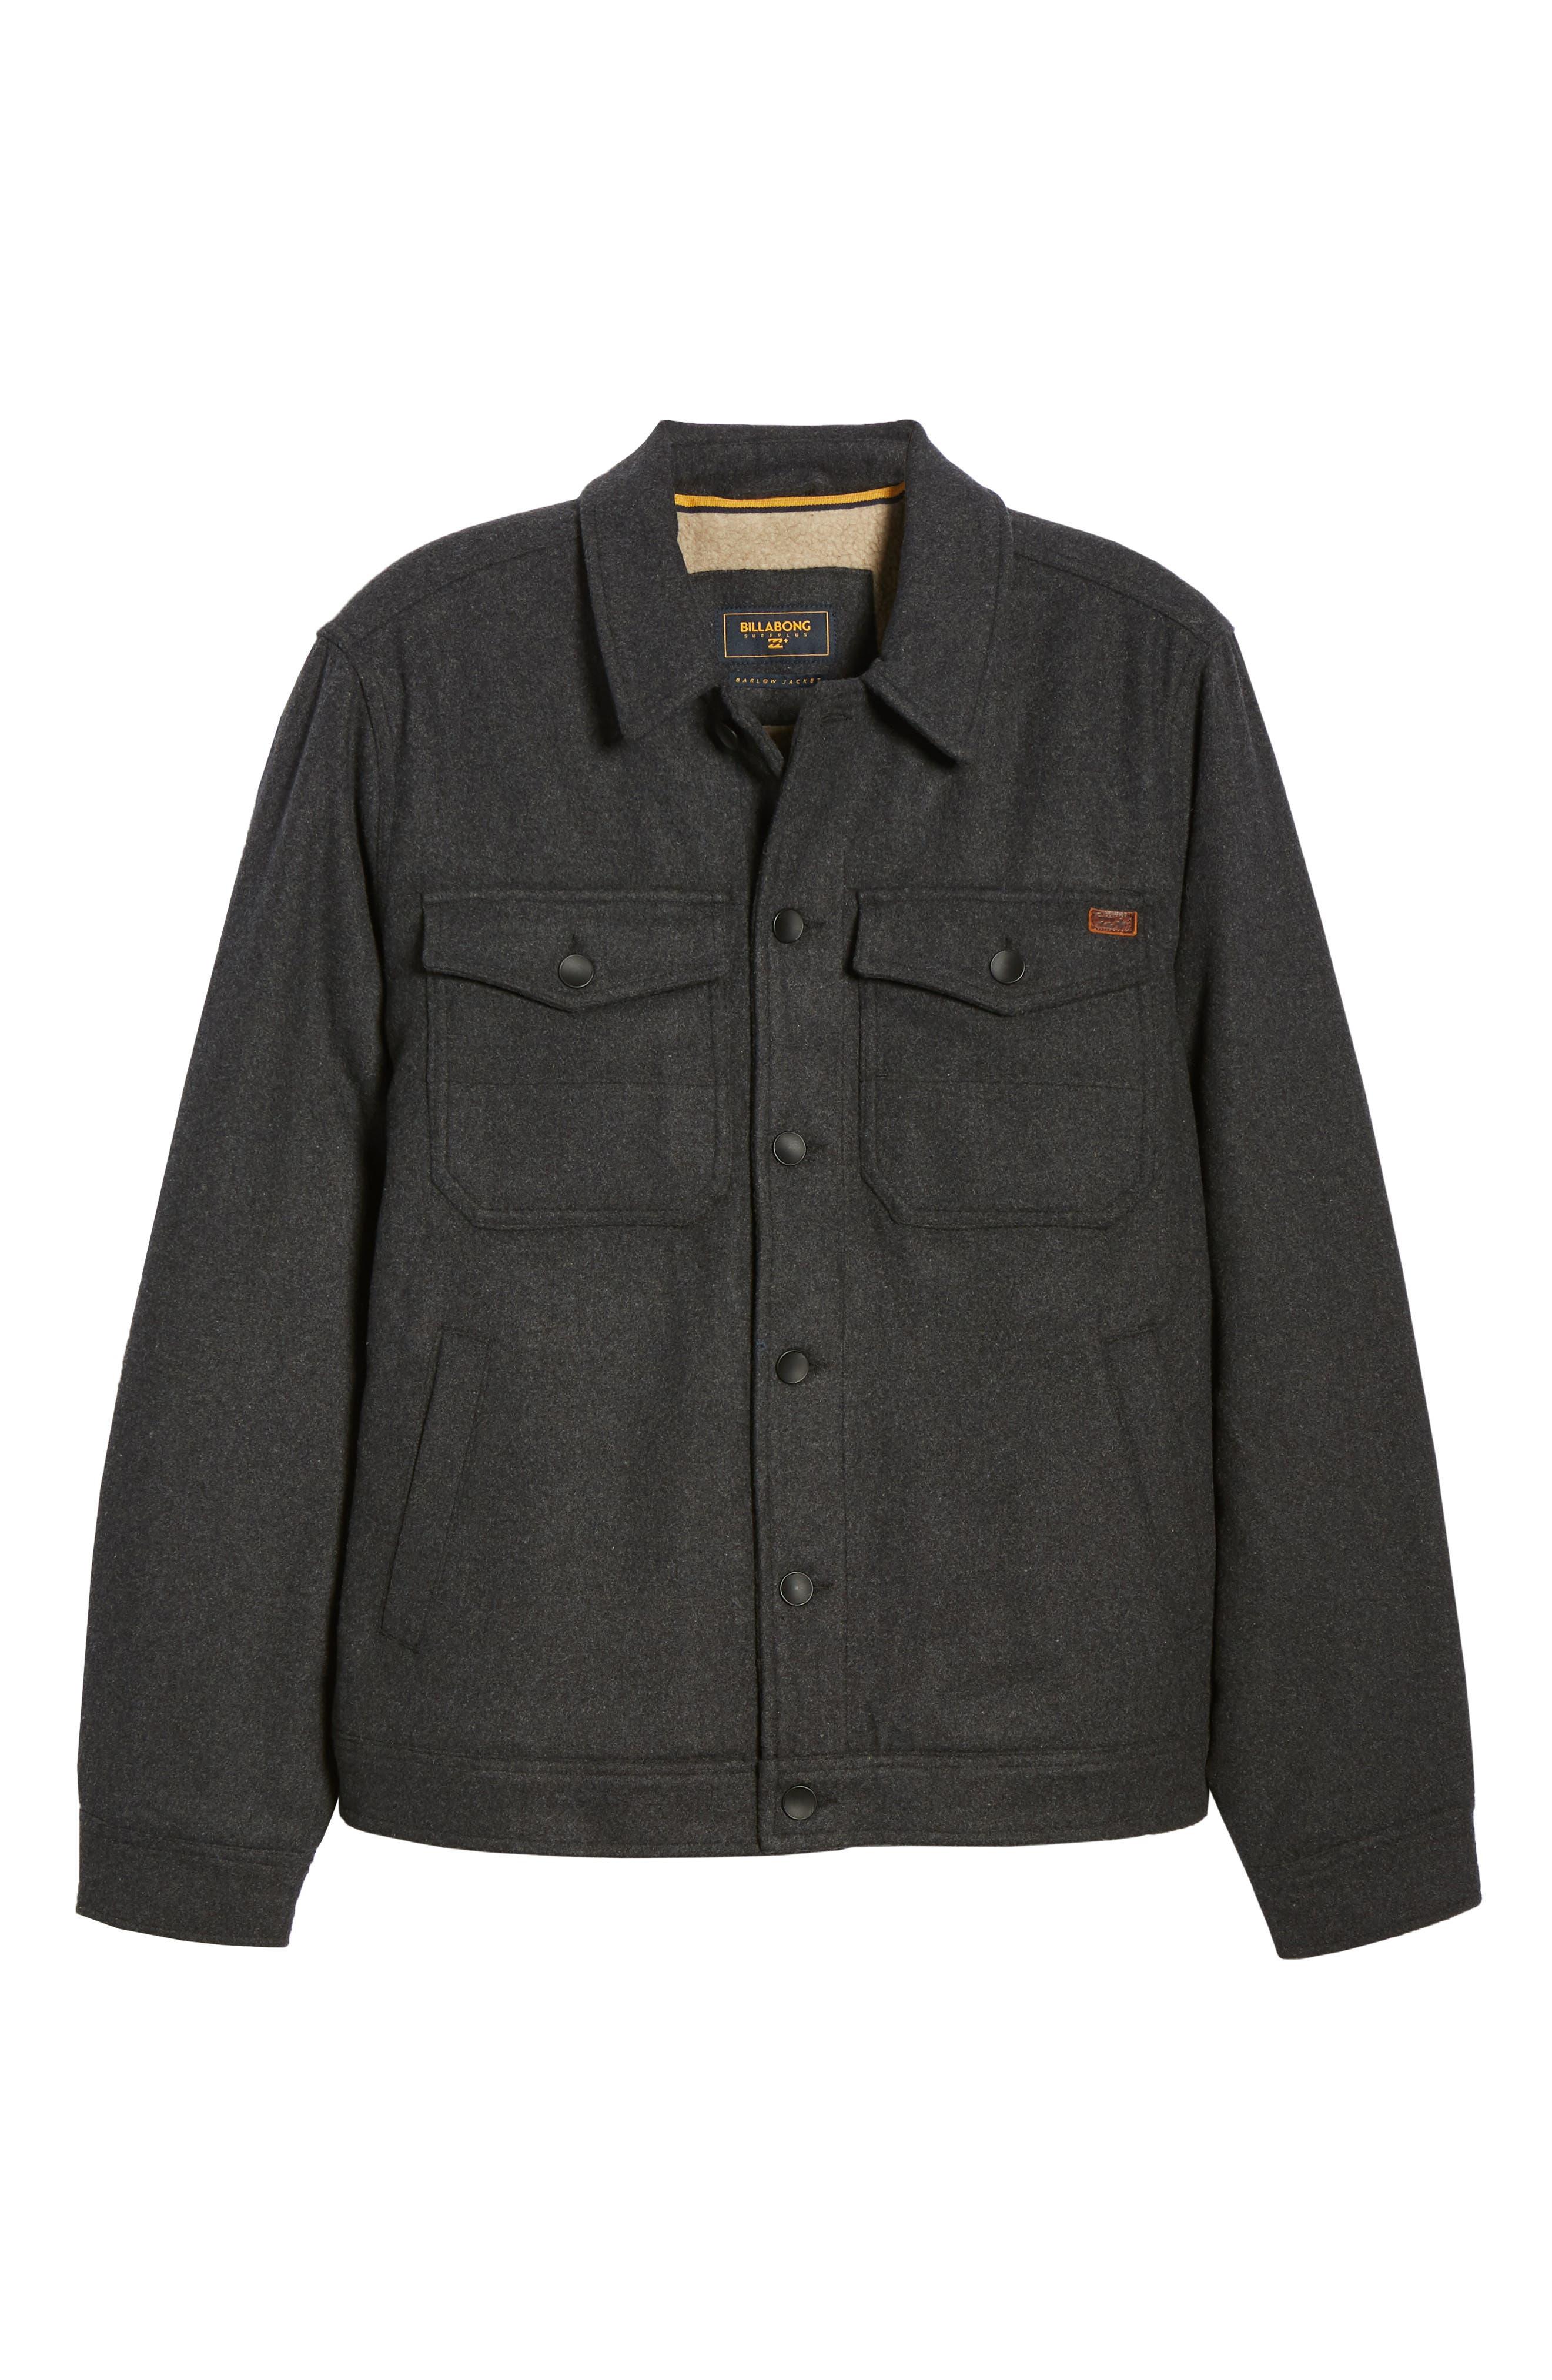 Barlow Jacket,                             Alternate thumbnail 3, color,                             BLACK HEATHER